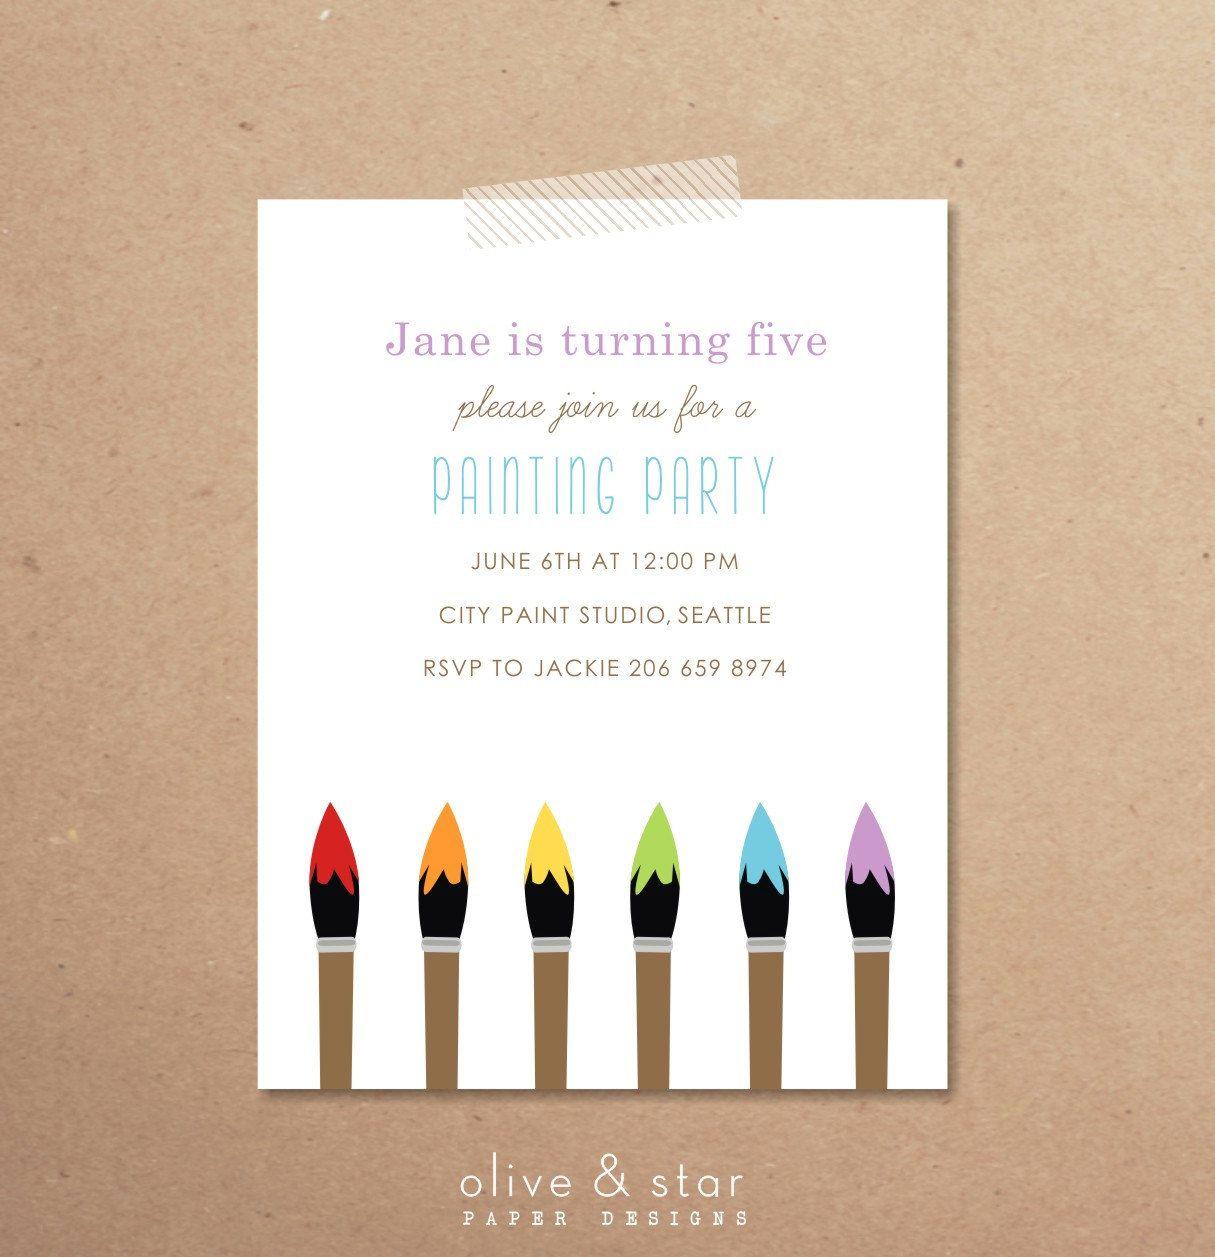 painting party birthday invitation. Love this idea! | Birthday ideas ...